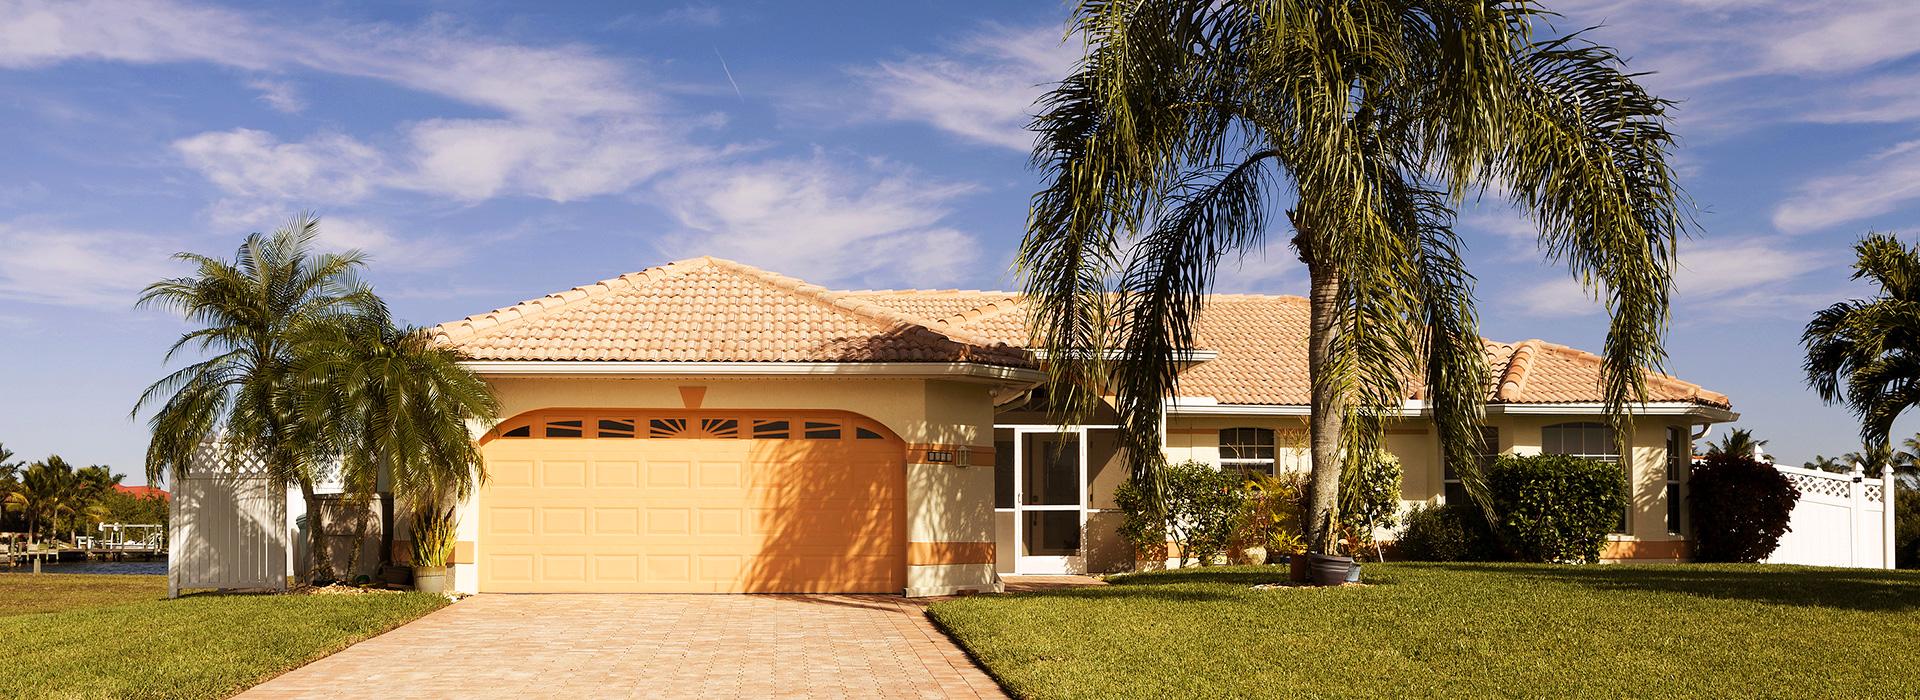 Homeowners Insurance Fort lauderdale